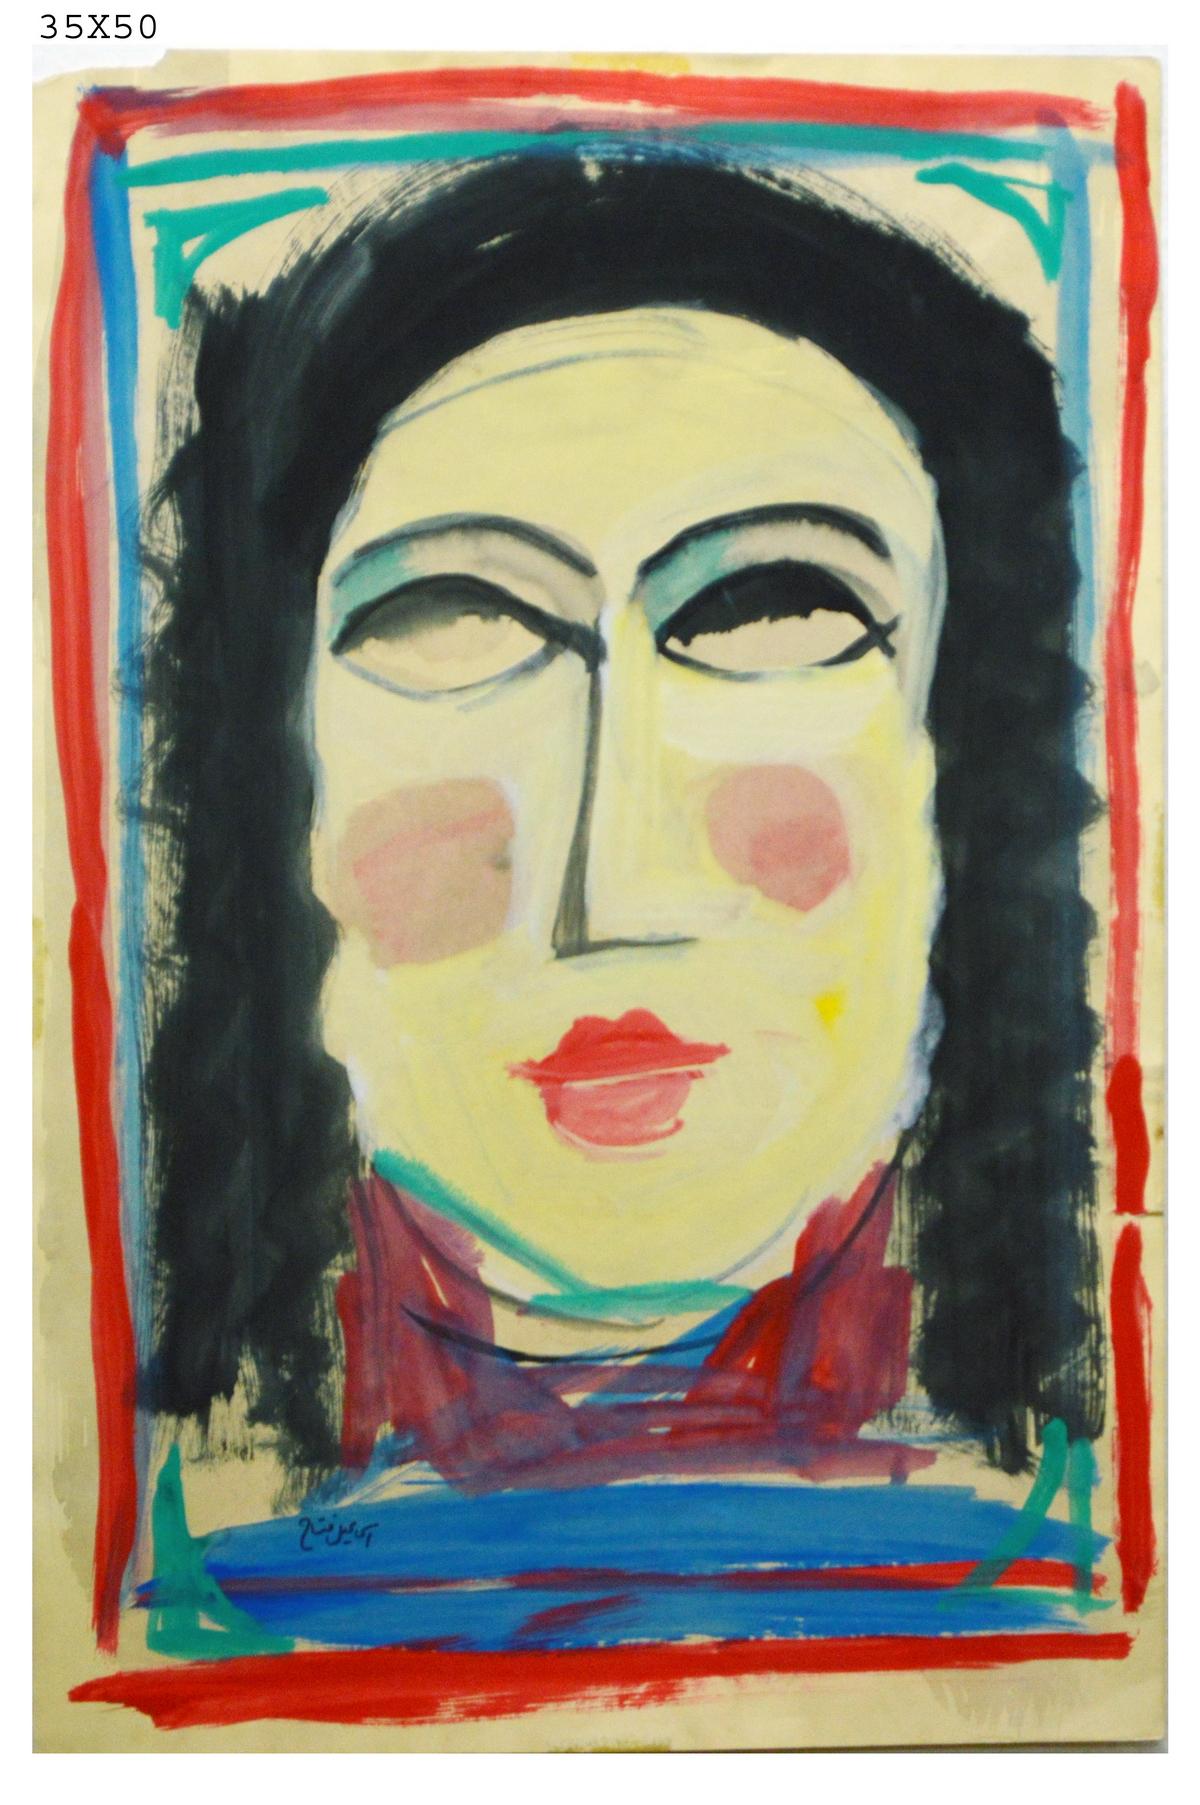 022_37 - Artist Ismail Fattah 50 in 35 gouache on paper  - الفنان اسماعيل فتاح (9).JPG